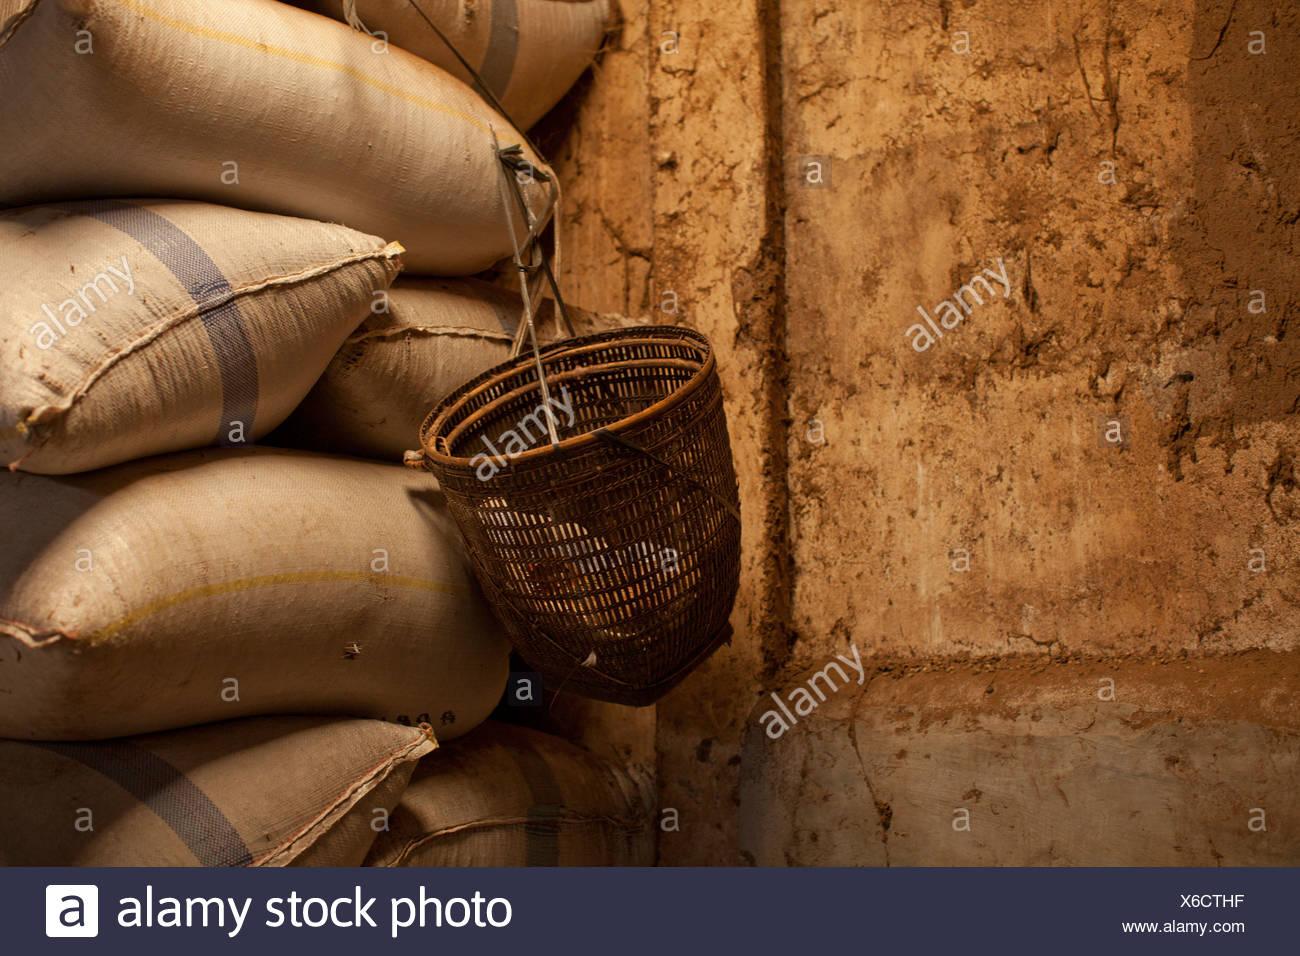 Sacks Of Coffee Beans; Muara Pinang Sumatera Selatan Indonesia - Stock Image